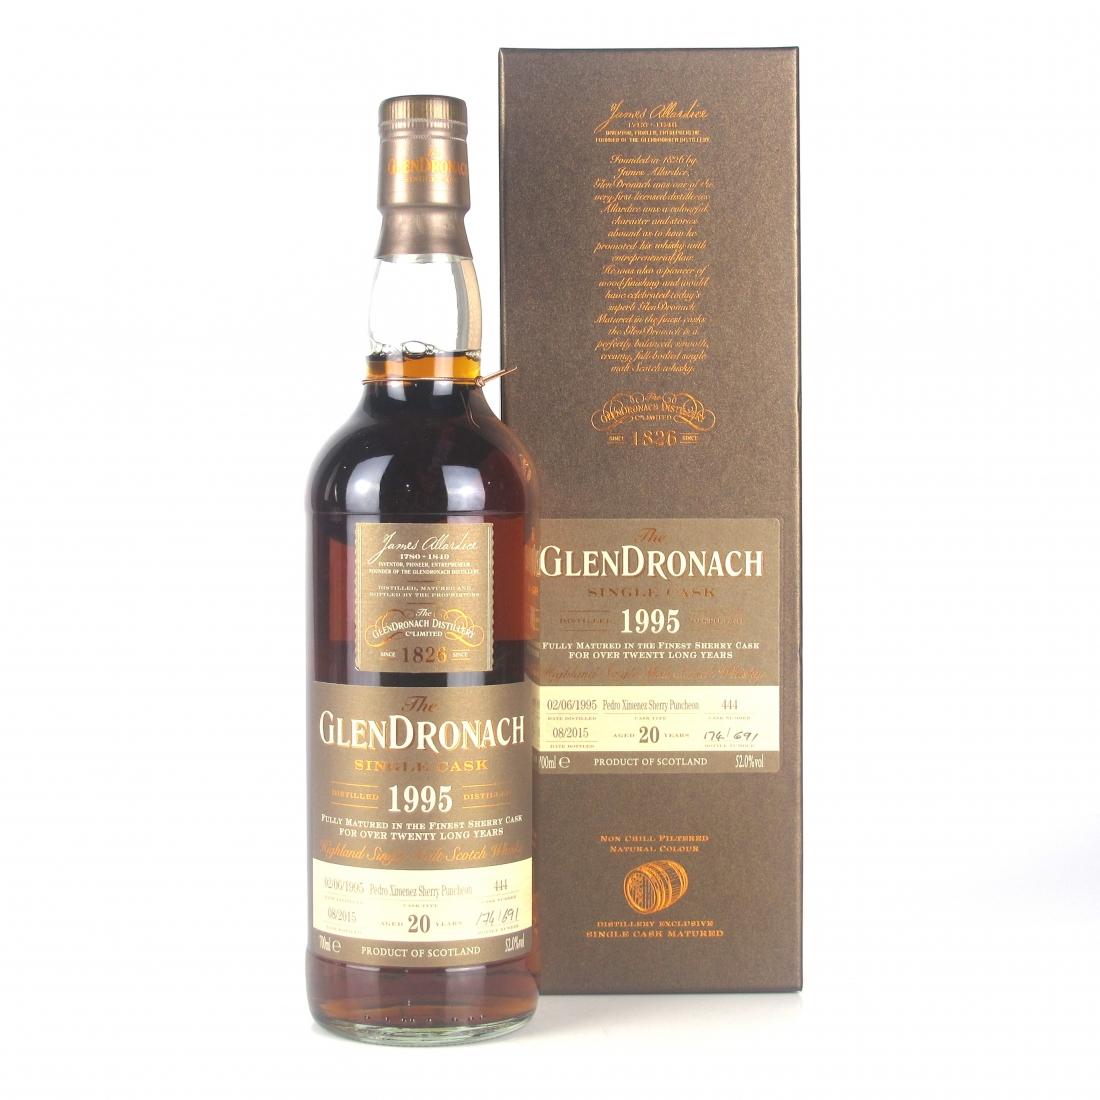 Glendronach 1995 Single Cask 20 Year Old #444